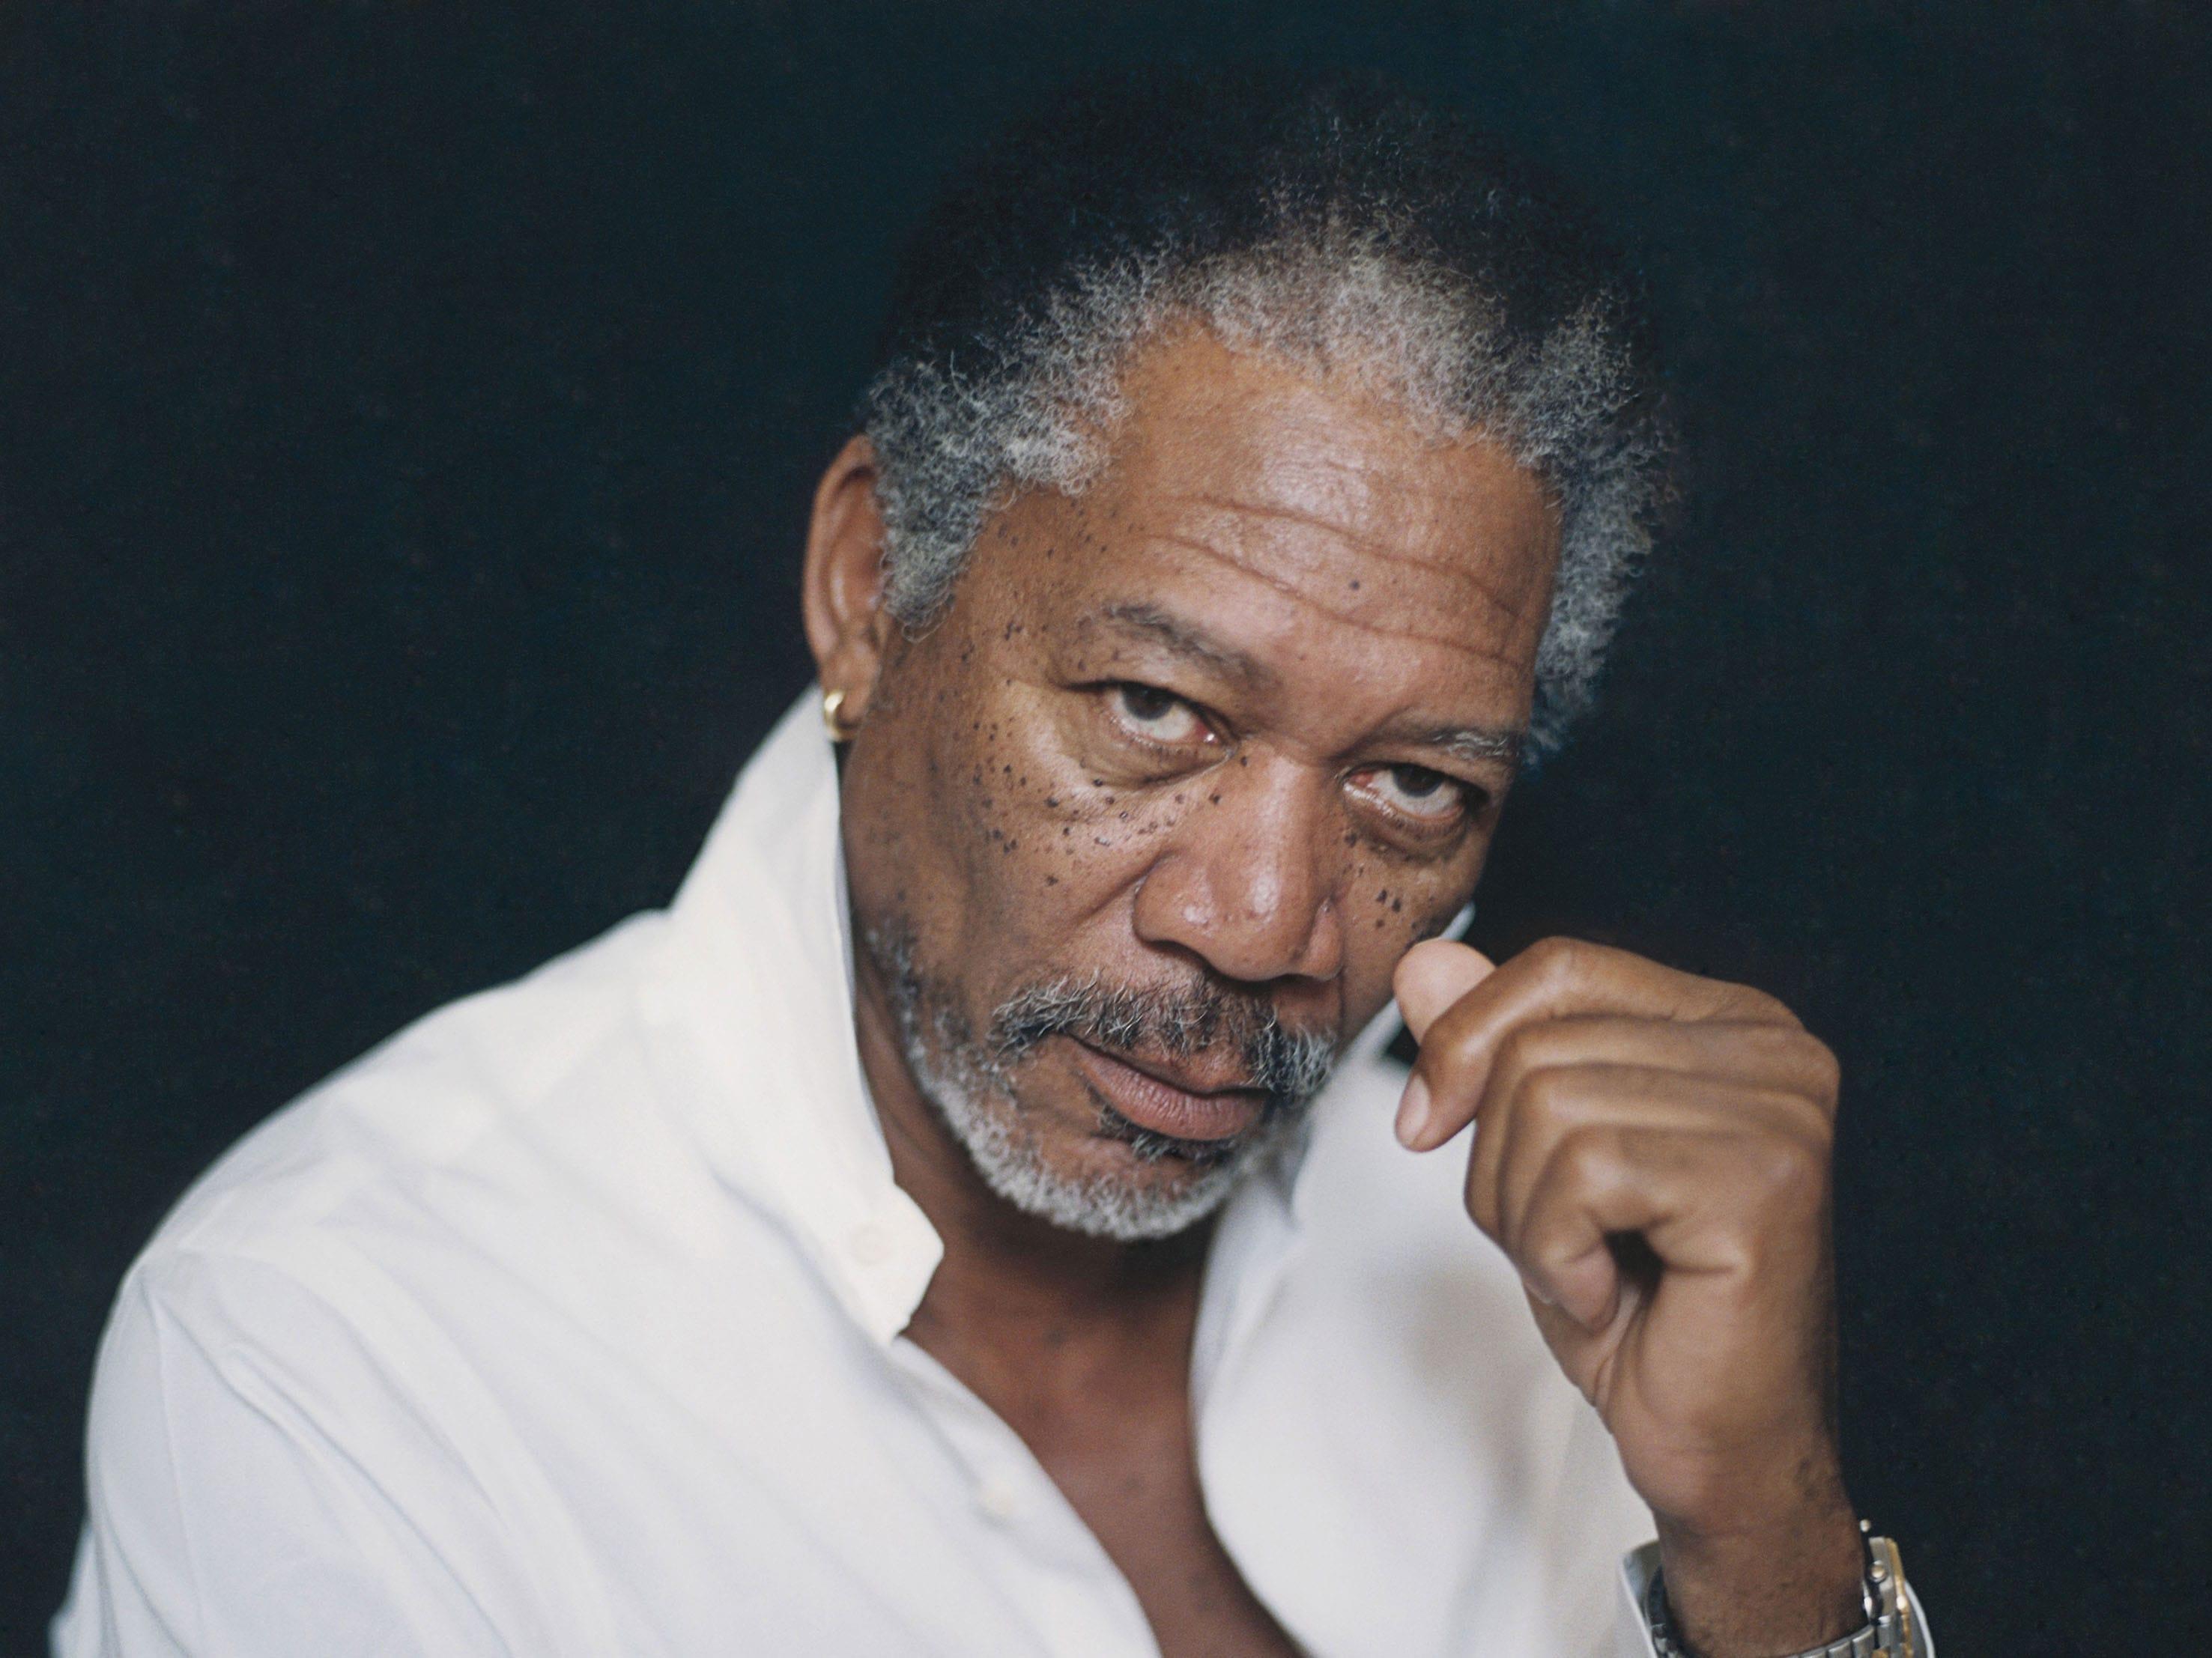 Morgan Freeman HQ wallpapers